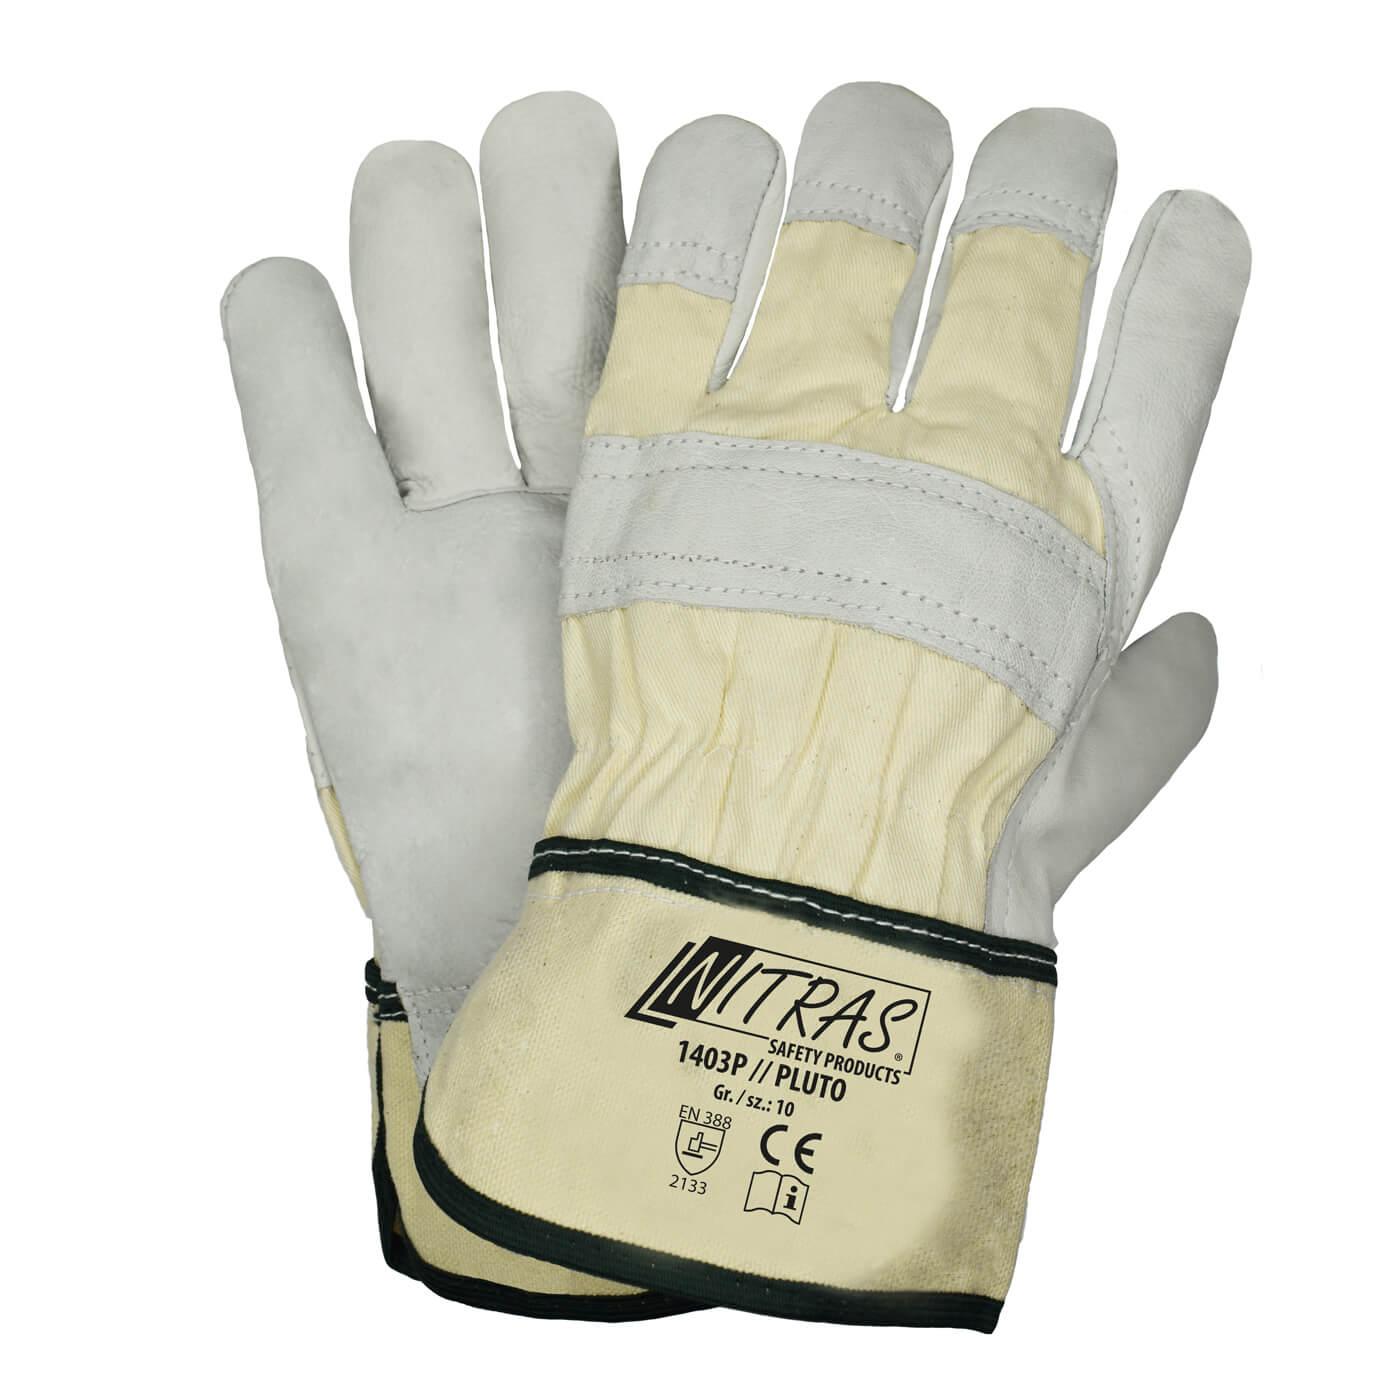 Rękawice skórzane Nitras 1403P/ PLUTO